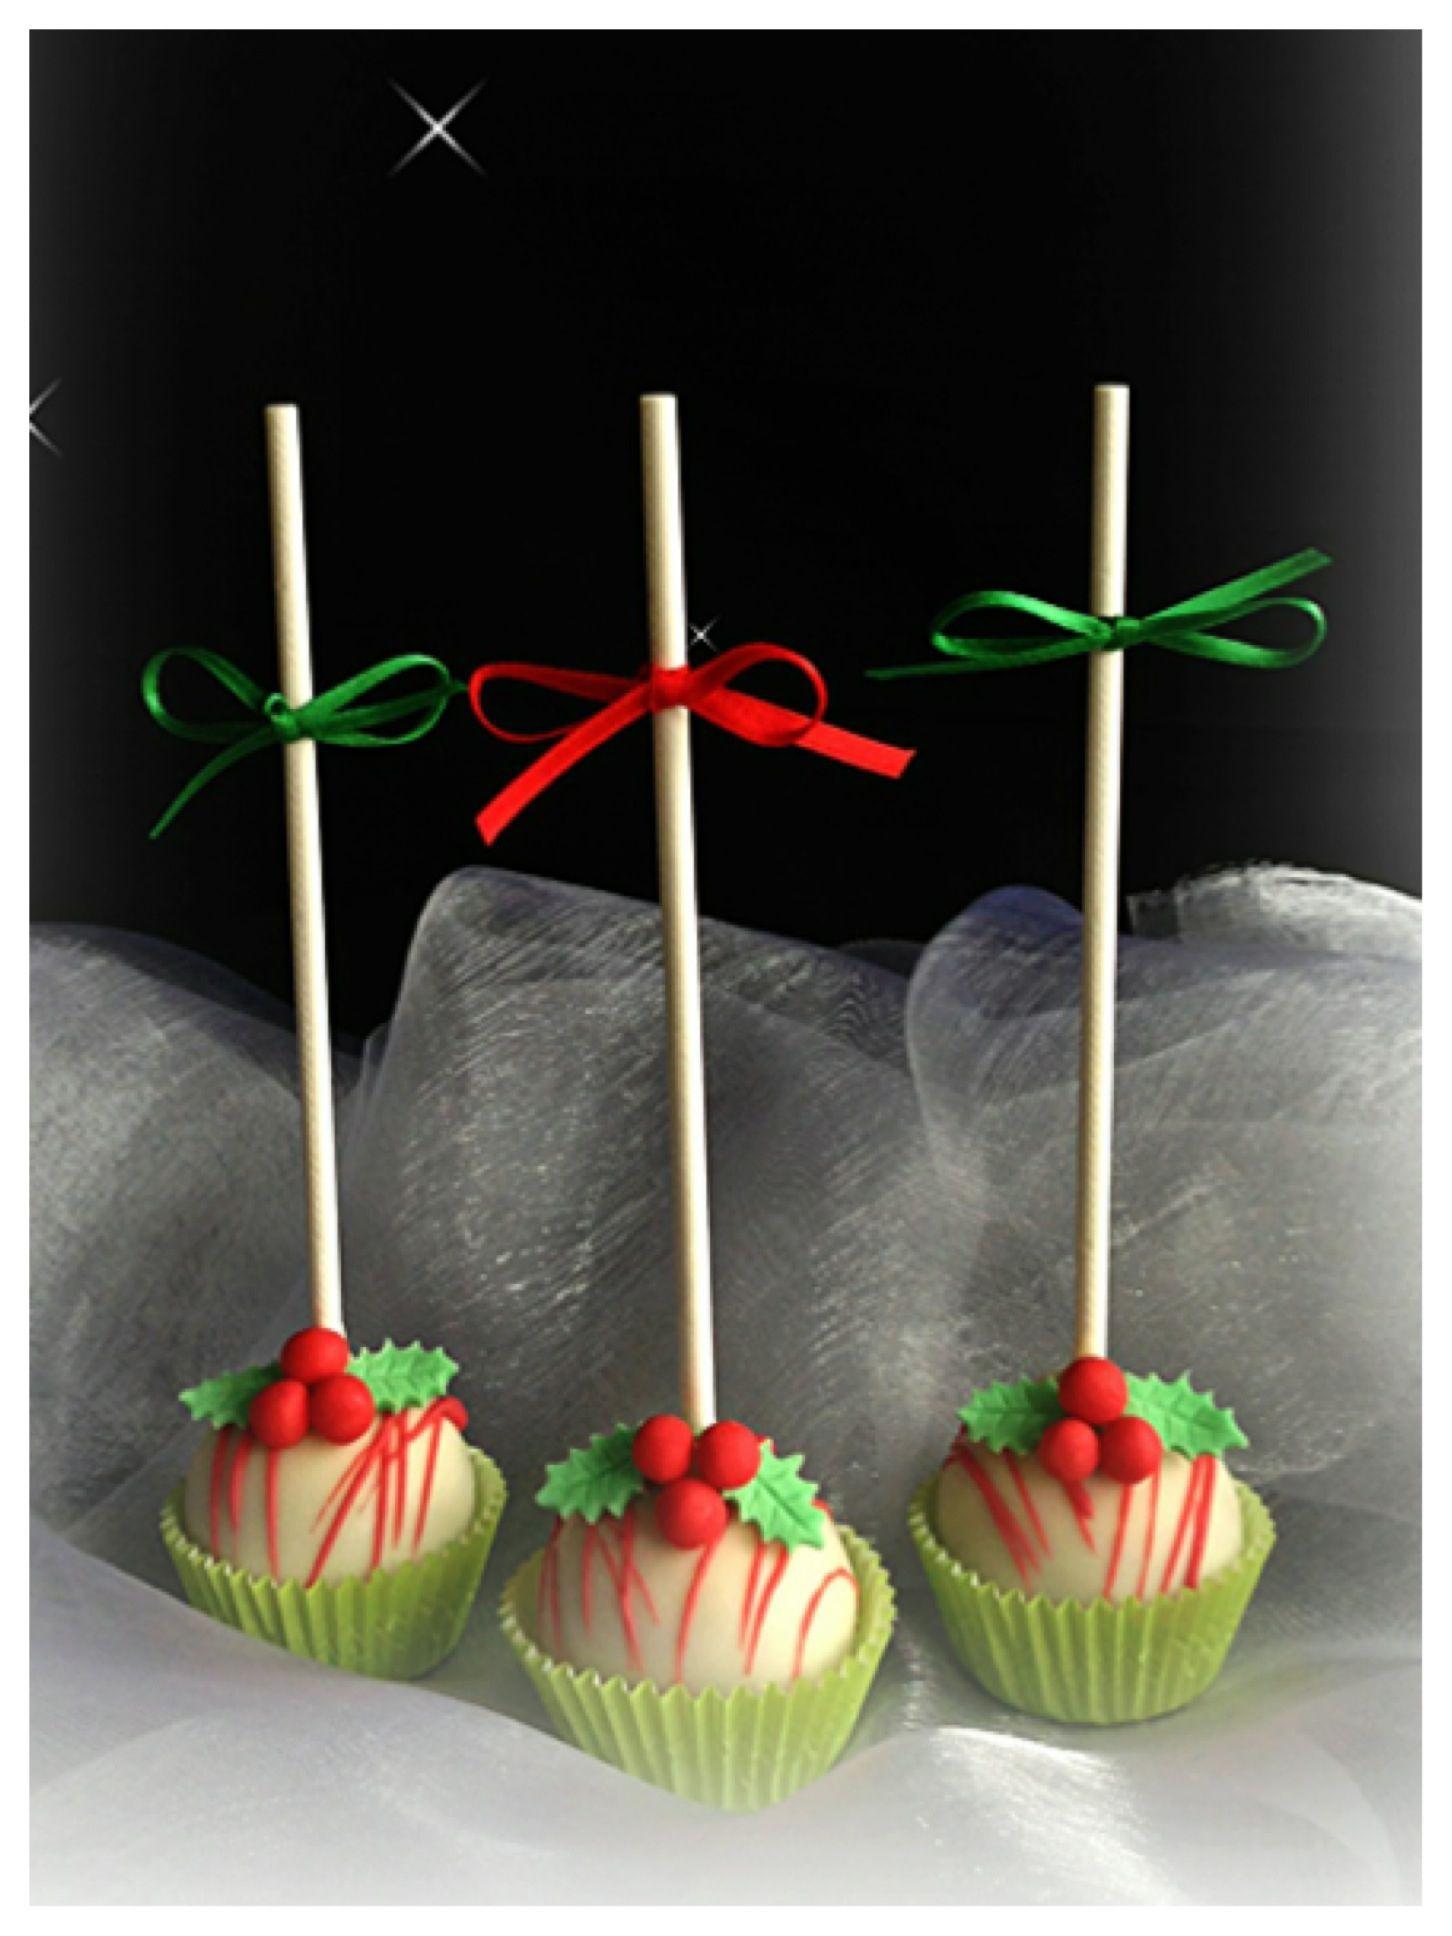 Images Of Christmas Cake Balls : Christmas Cake Pops - By Taaartjes Cake Pops!! Pinterest